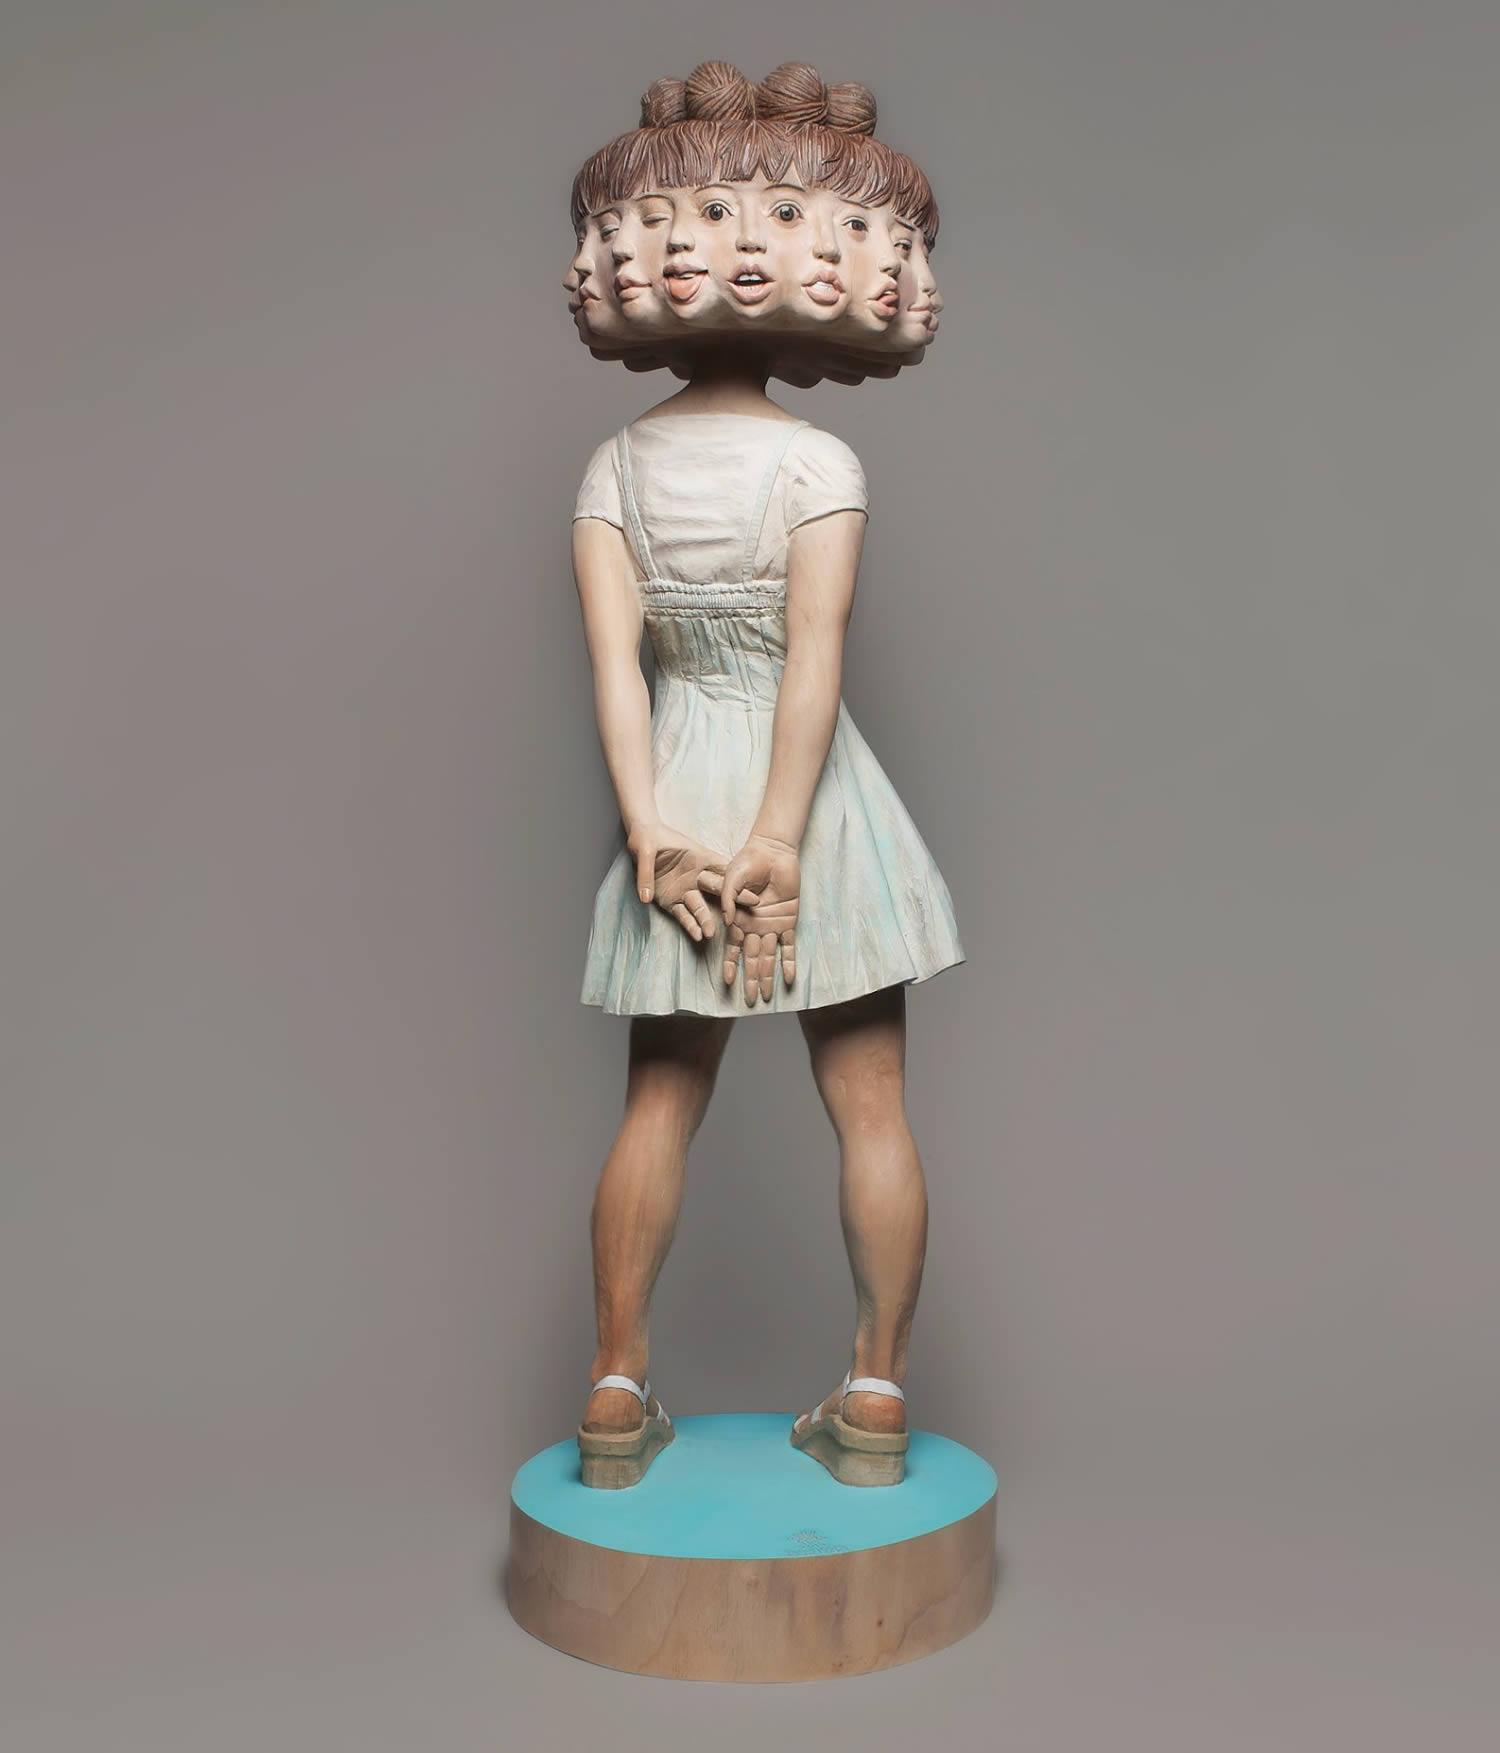 rotating head girl sculpture